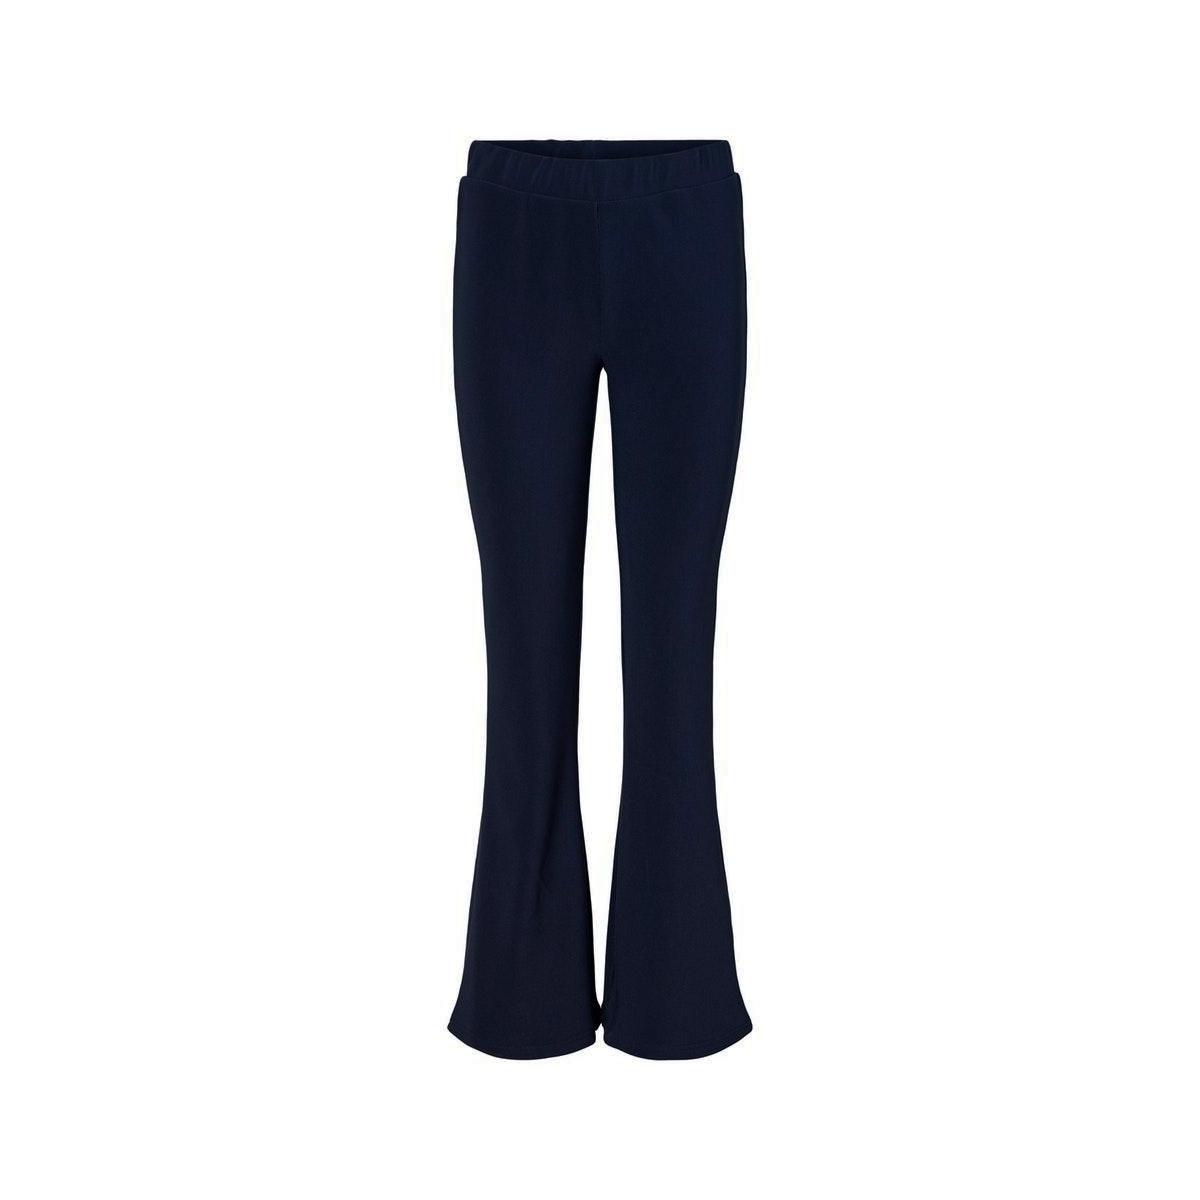 nmbillie nw rib flared pants 27012513 noisy may broek black